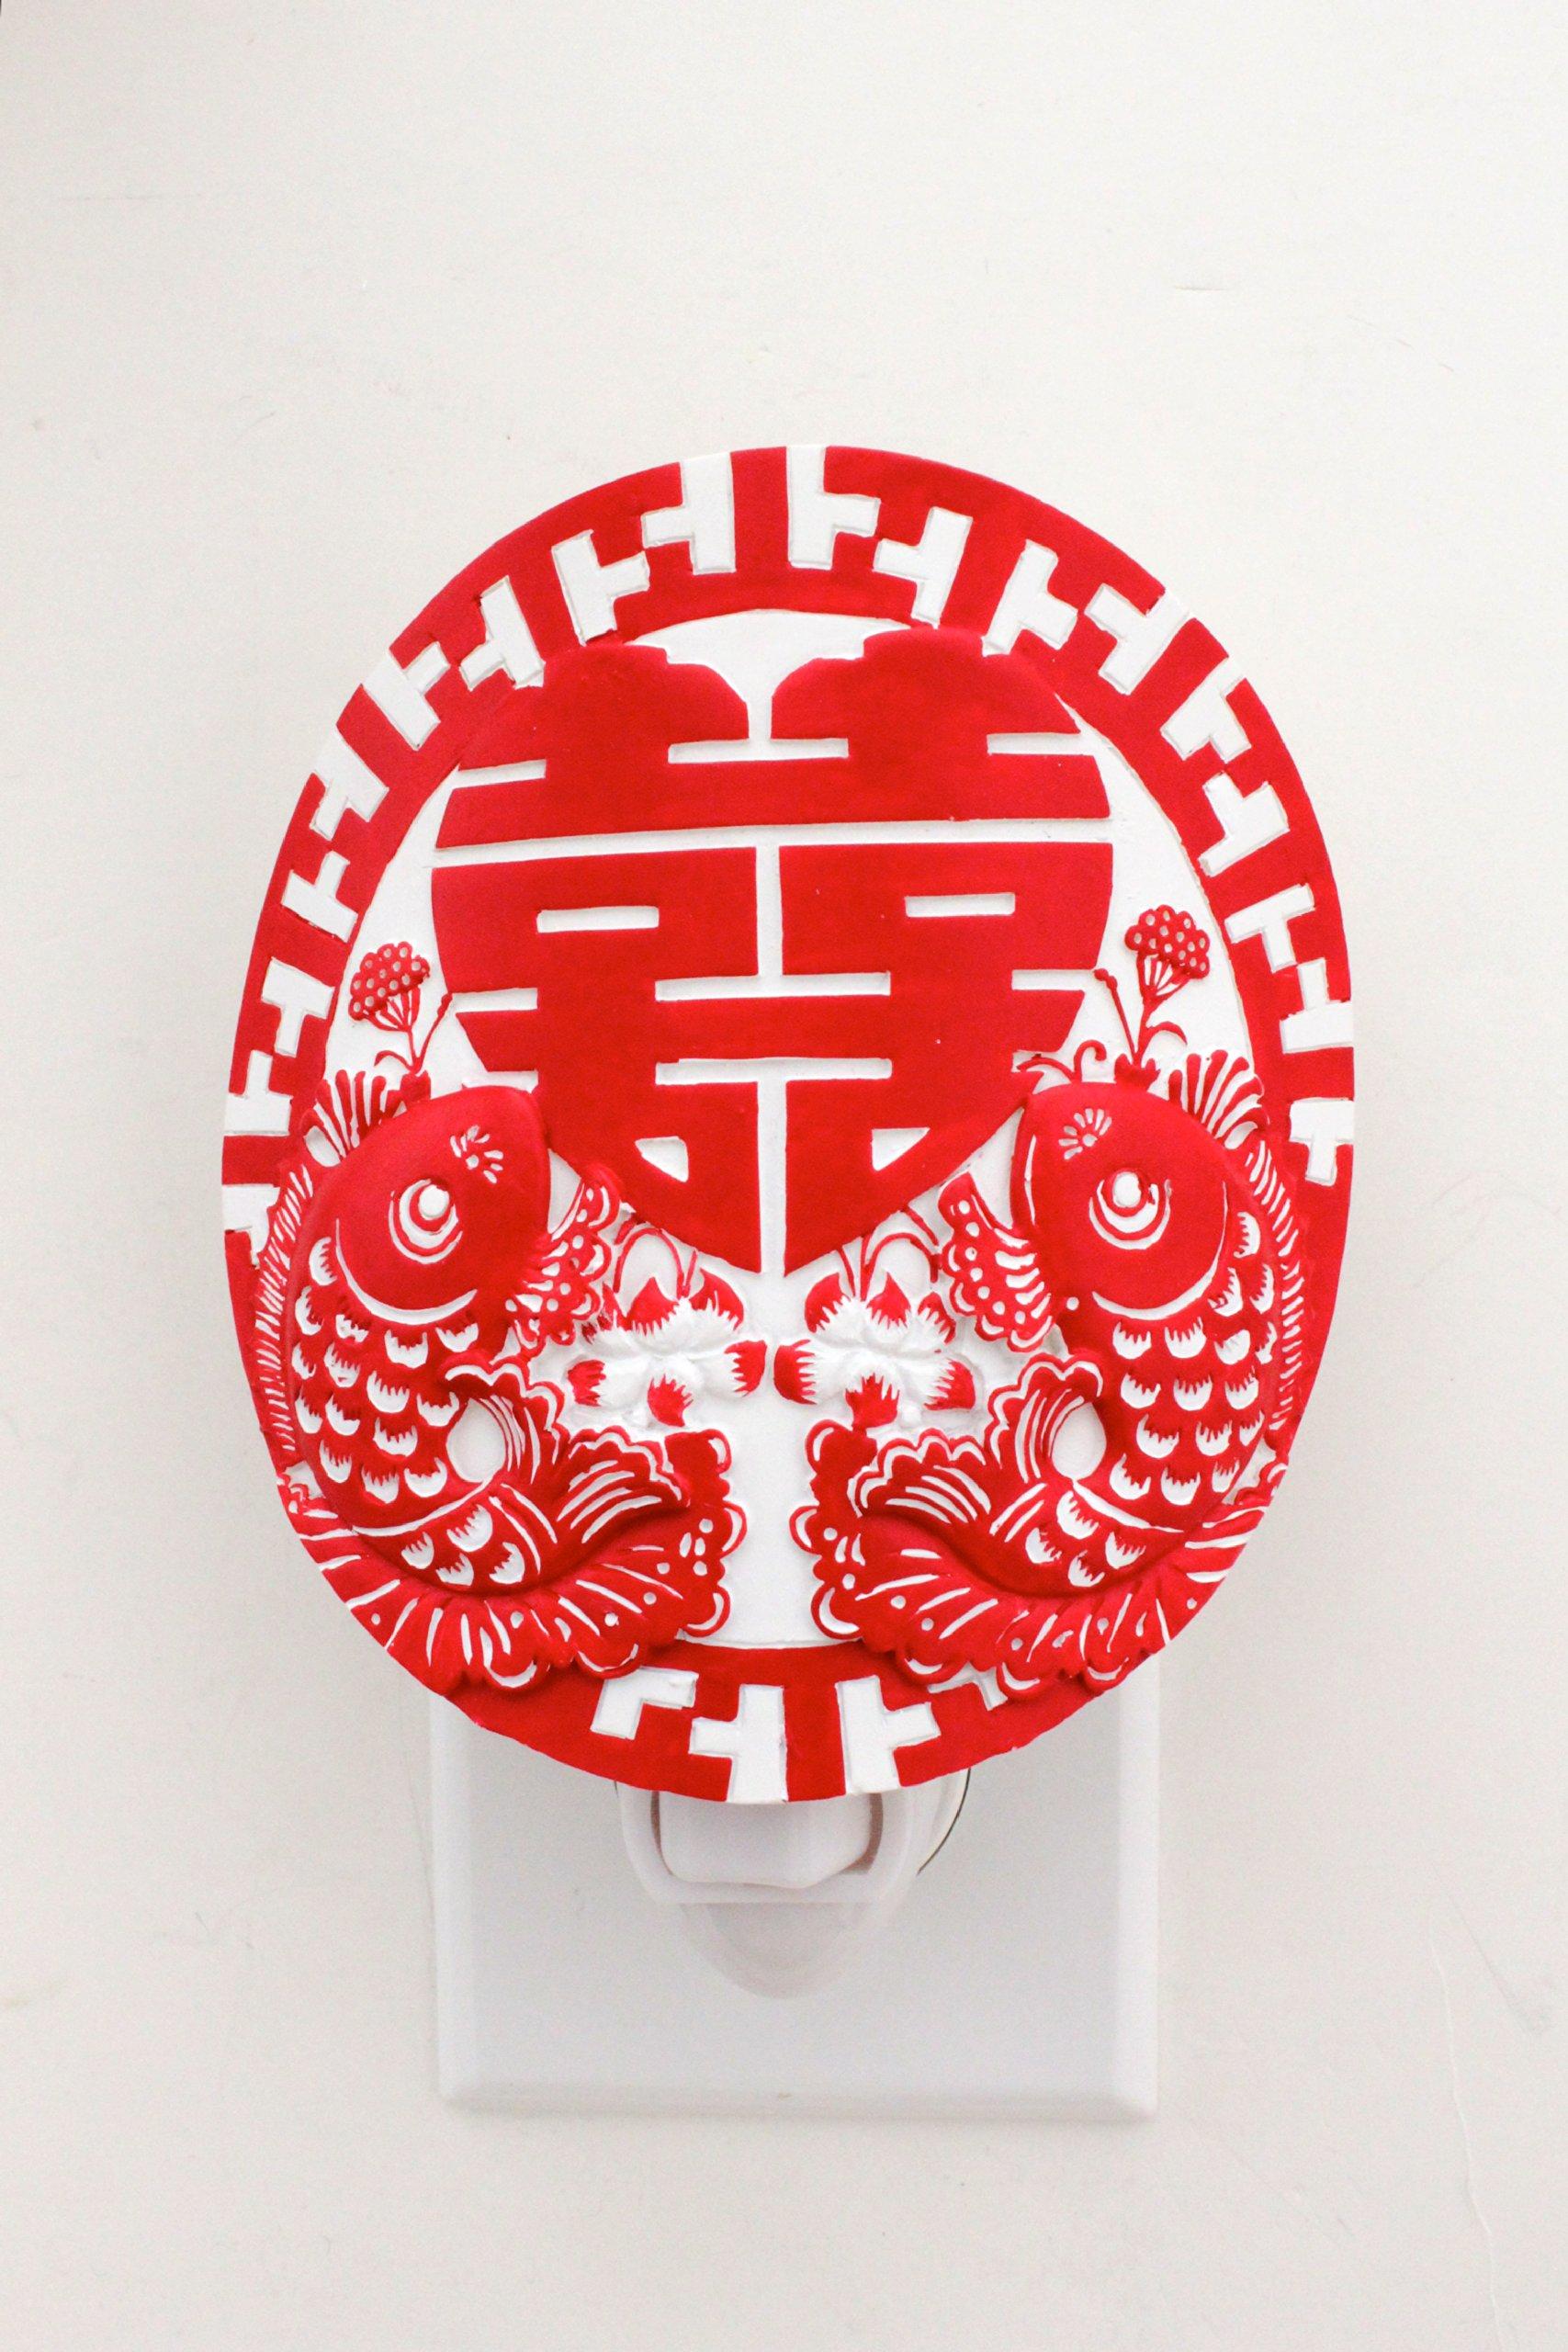 Chinese Symbol Red Double Fish & Heart Double Lucky Nightlight Night Light Night Lite